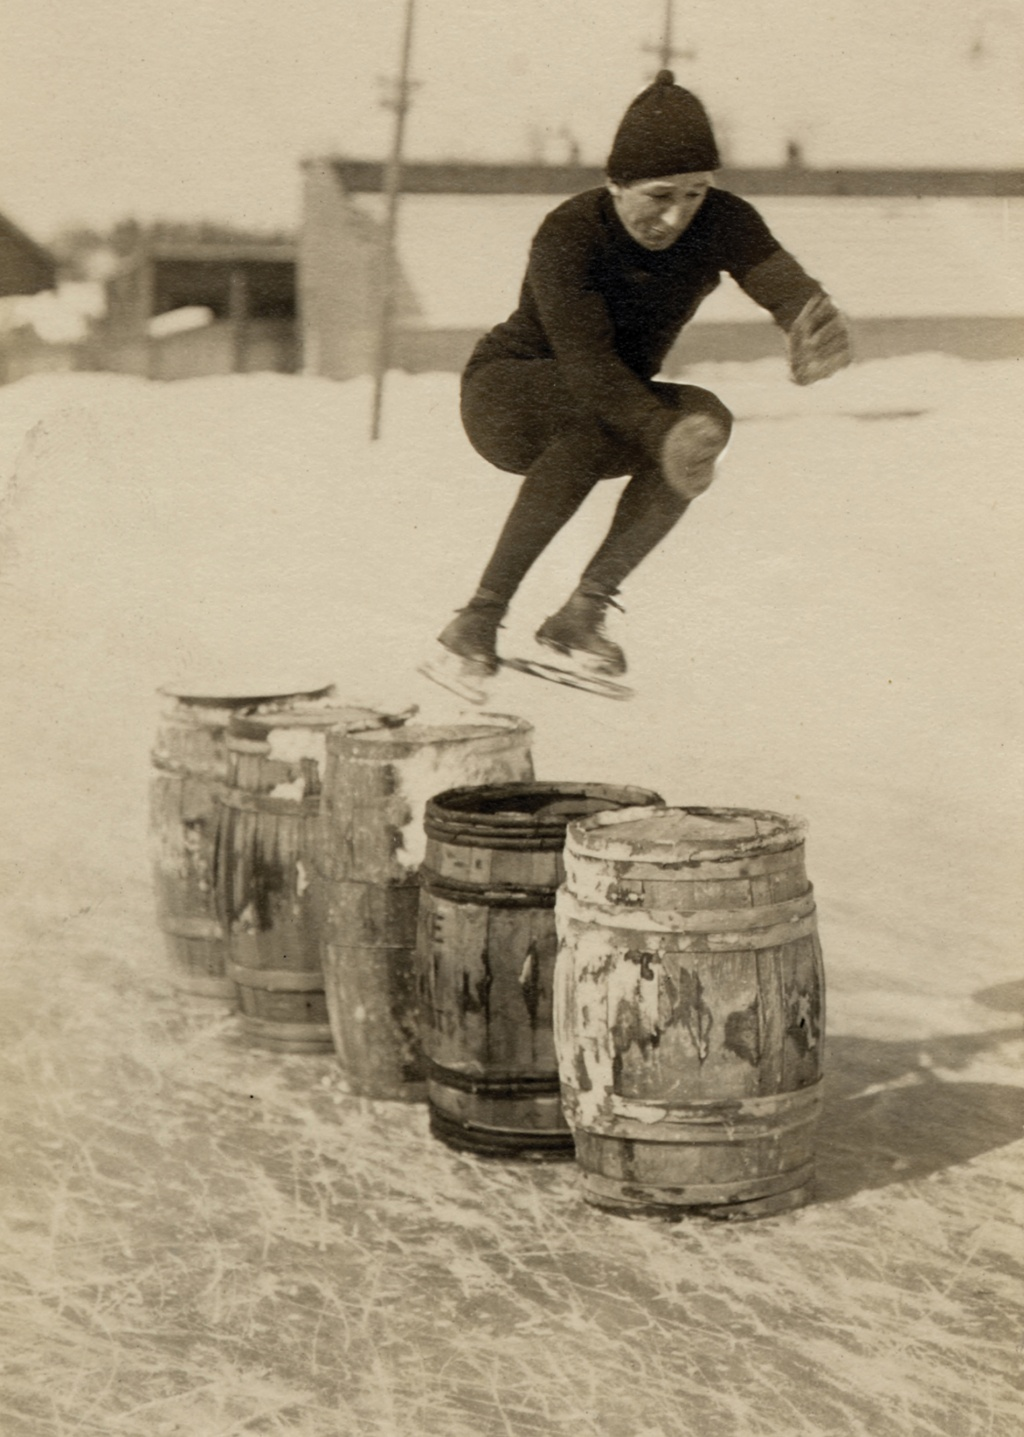 vintage pic of a speed skater jumping barrels